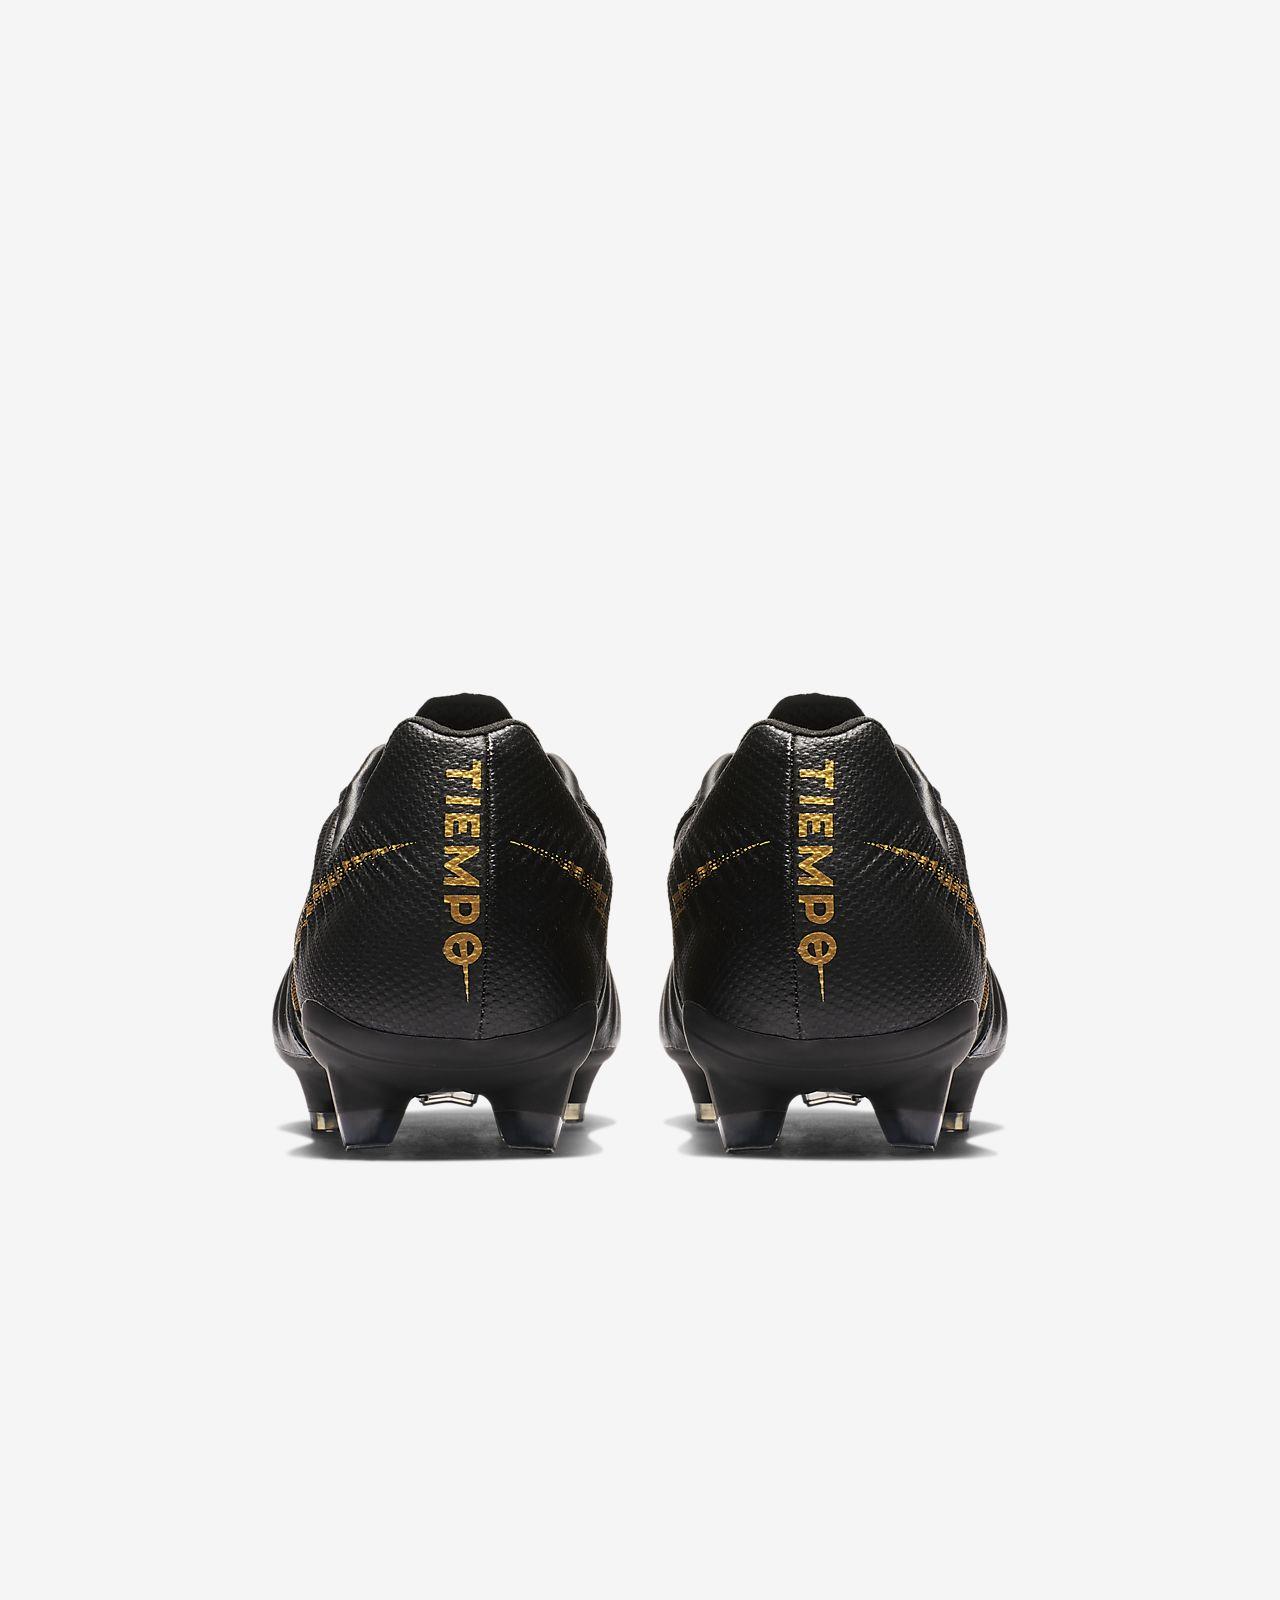 newest 194ee fc965 Nike Legend 7 Pro FG fotballsko til gress. Nike.com NO